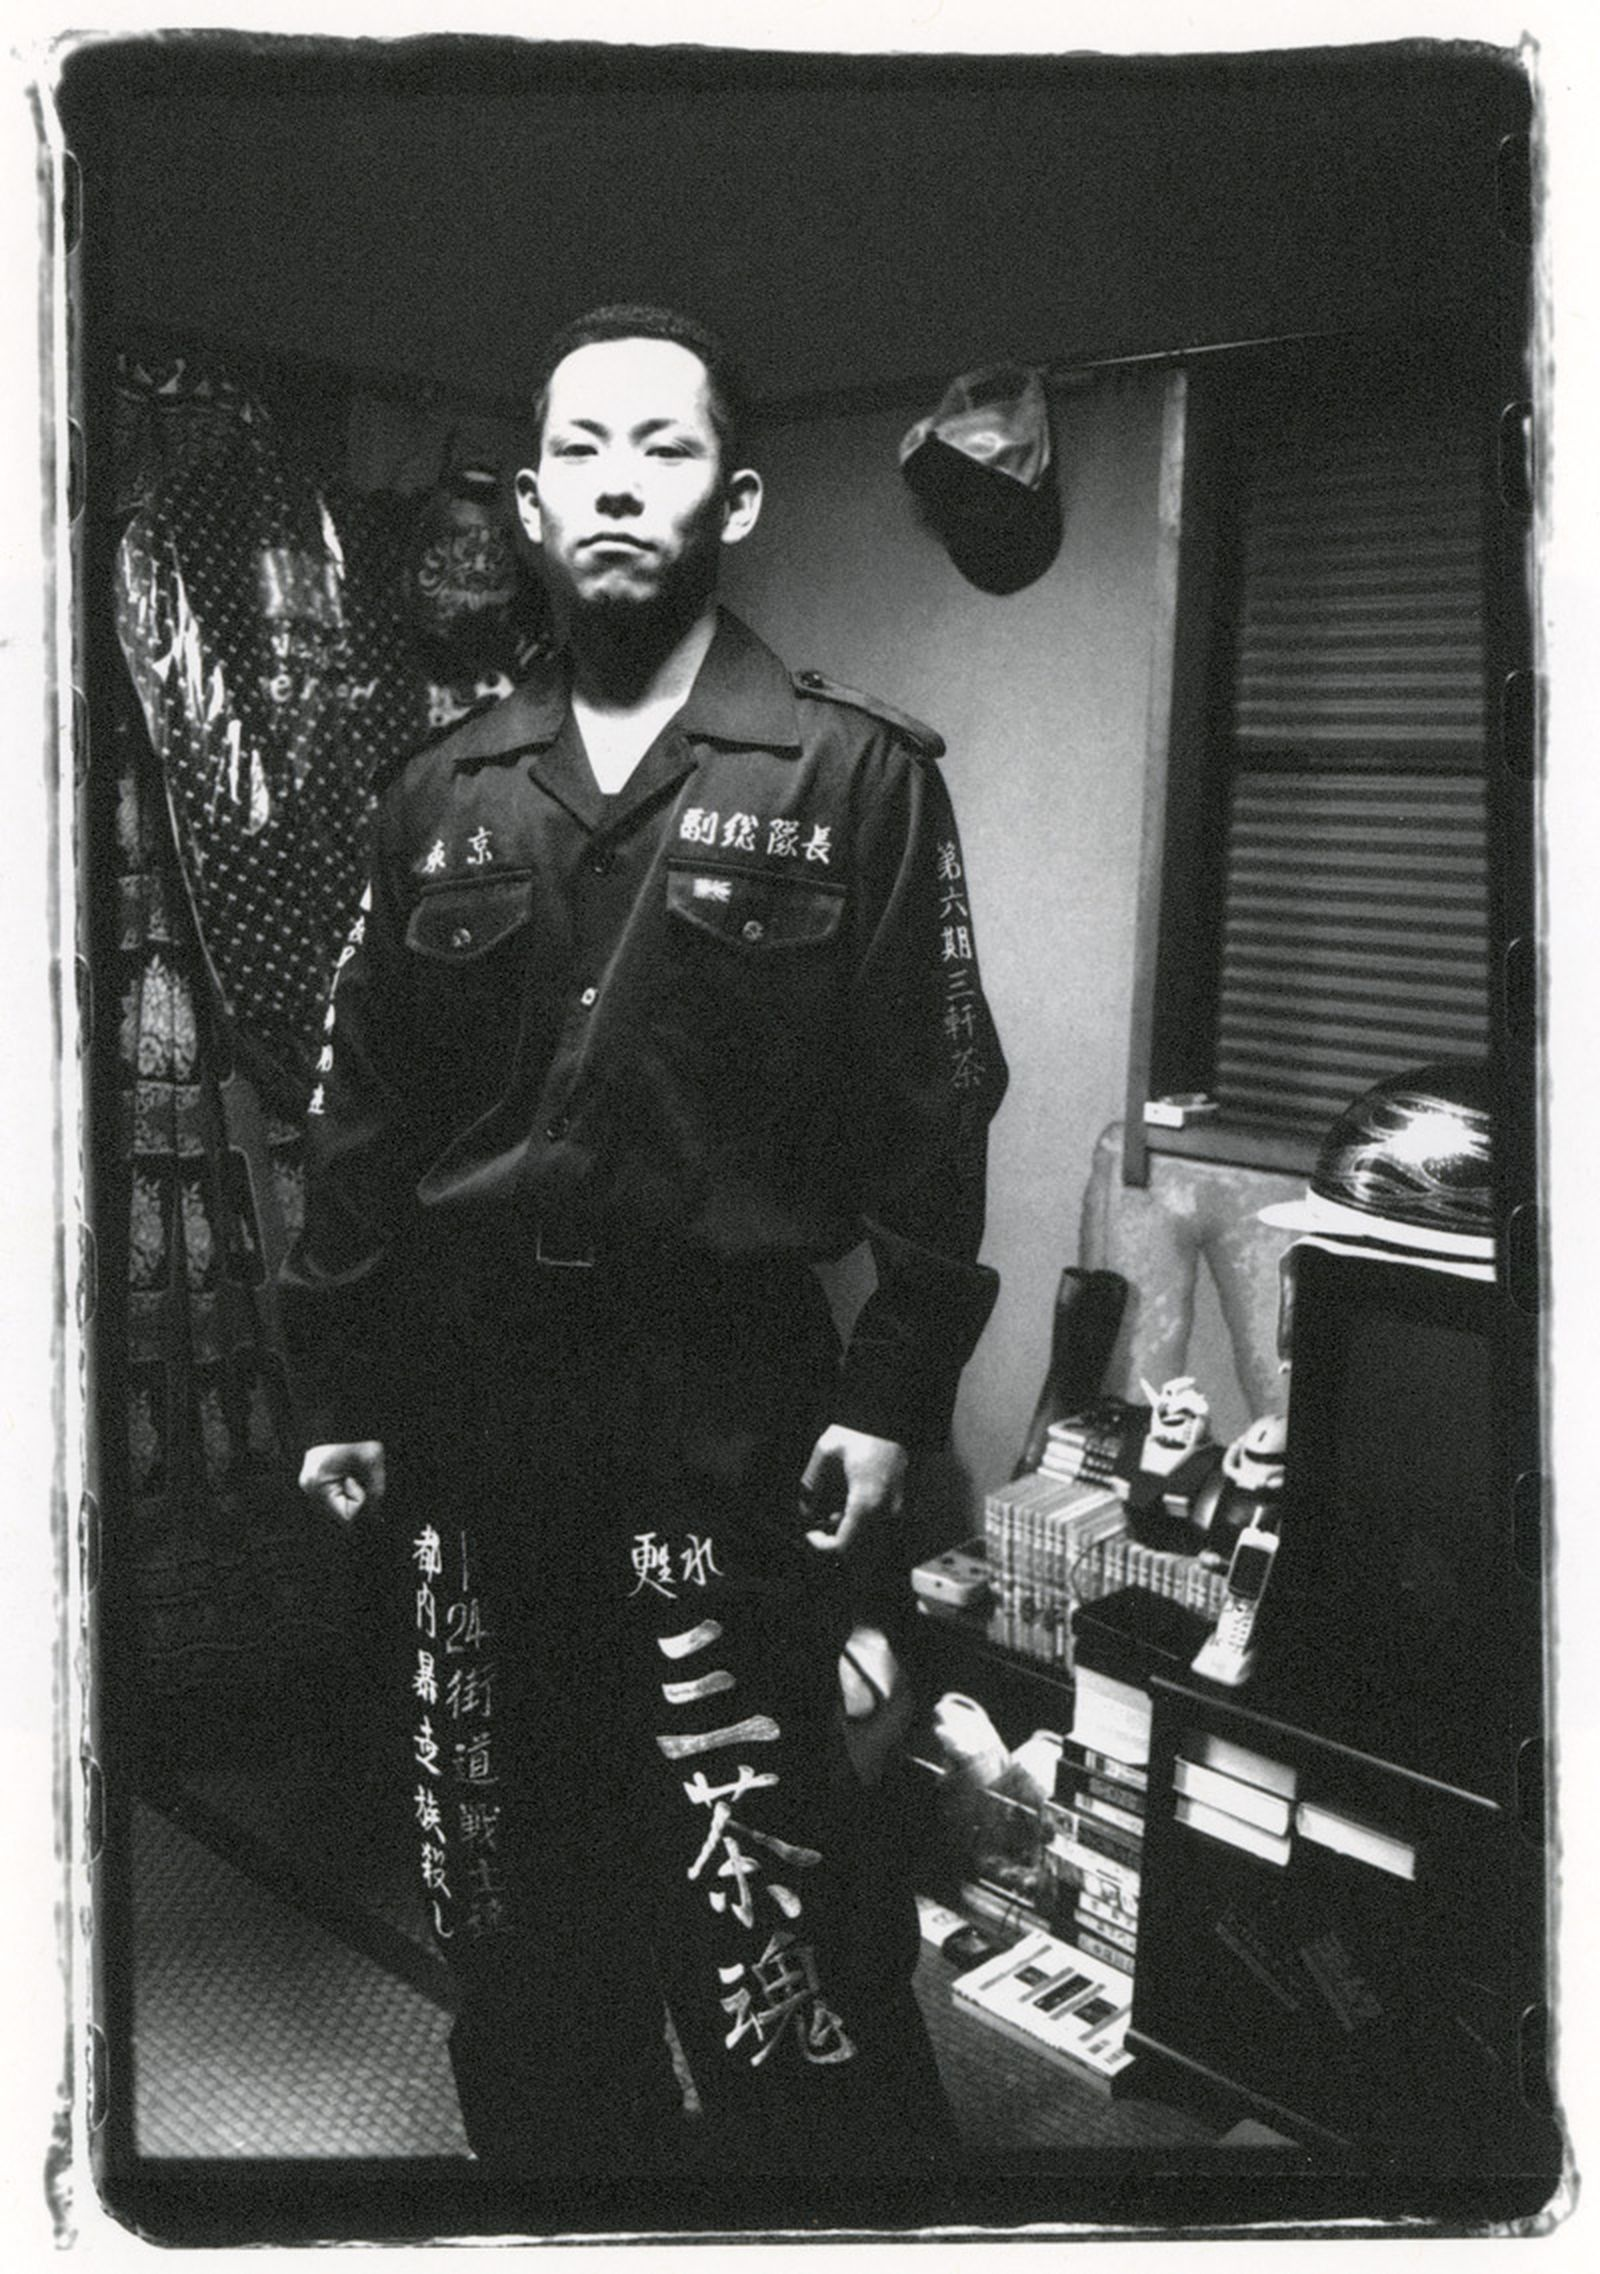 bosozoku-the-stylish-legacy-of-japans-rebel-motorcycle-gangs-3